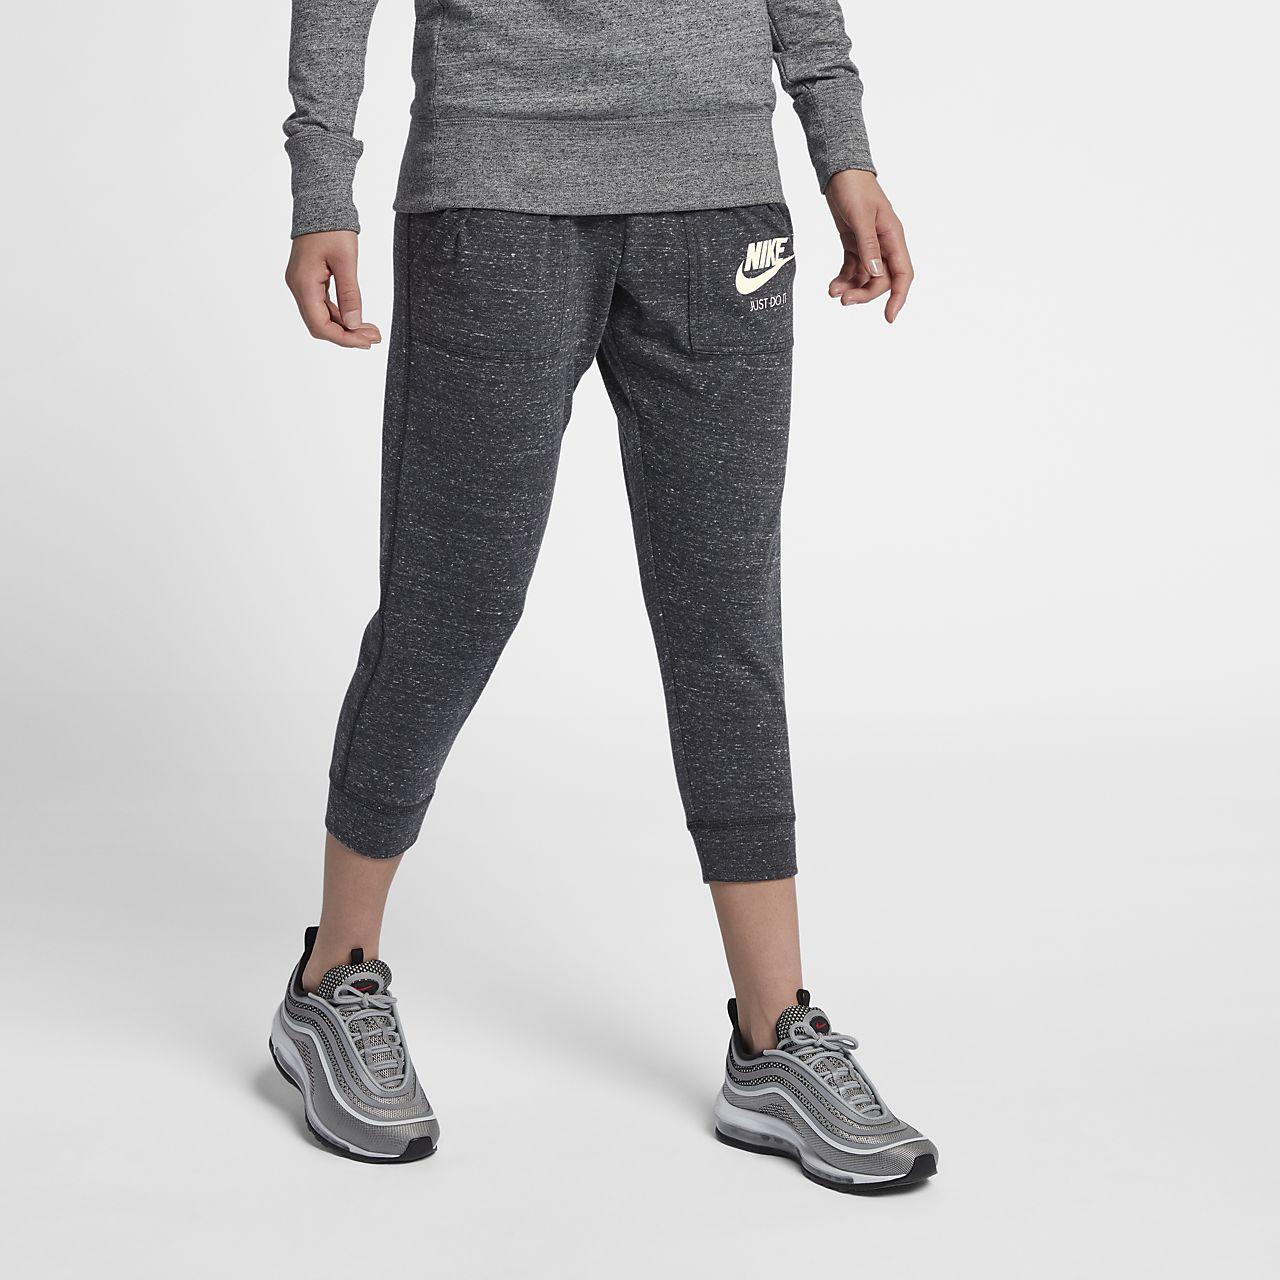 Lastest Nike Legend 2.0 Womenu0026#39;s Regular Cotton Capri Workout Pants ...